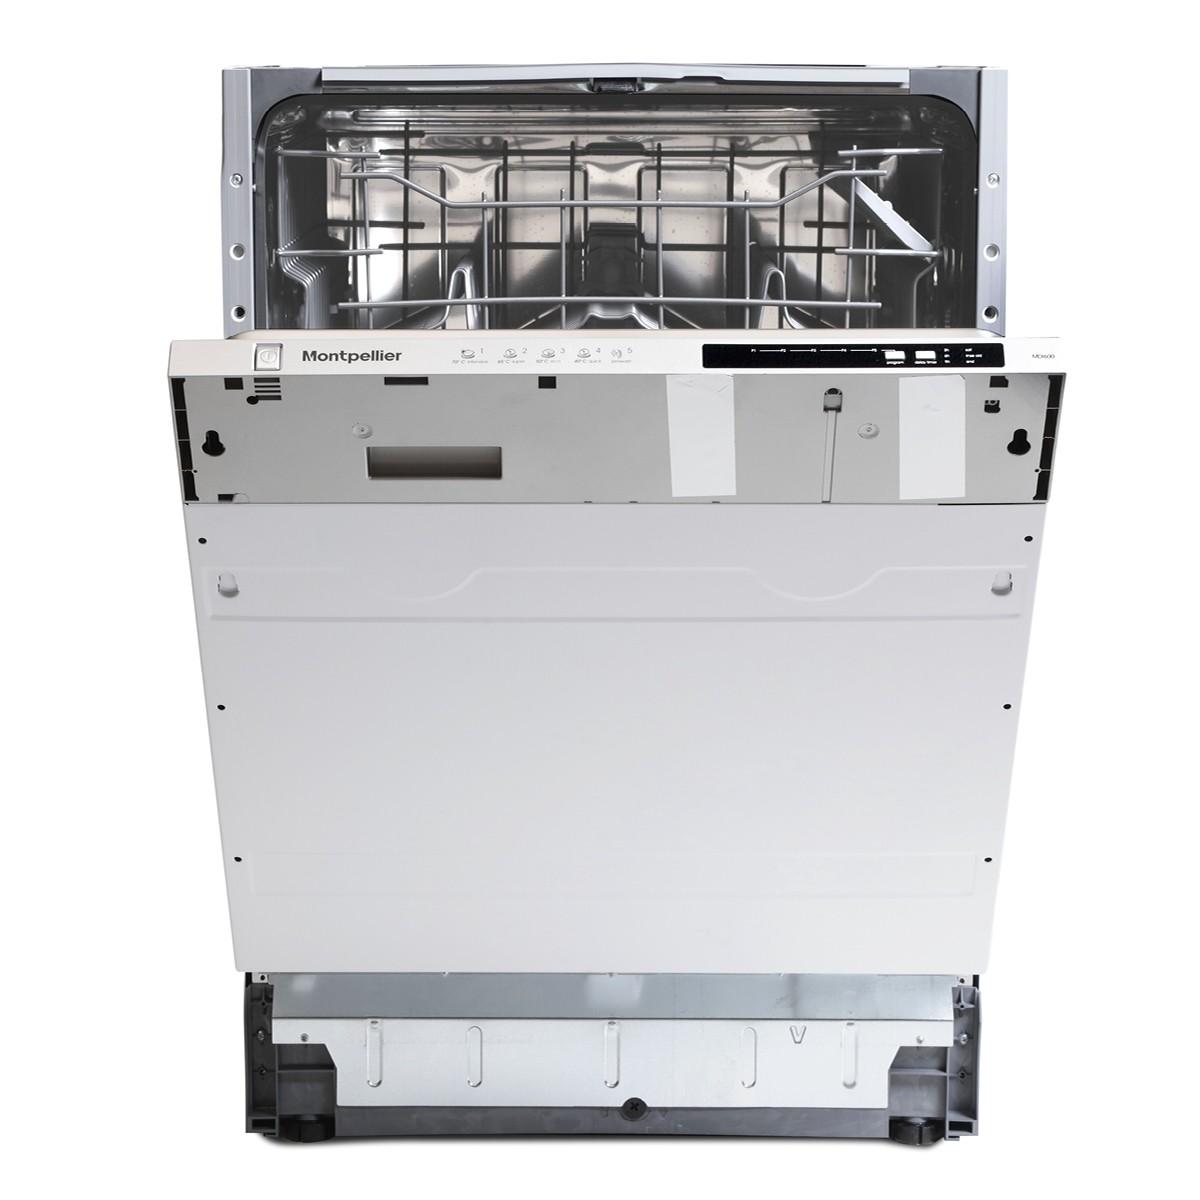 Montpellier MDI605 Full Size Dishwasher